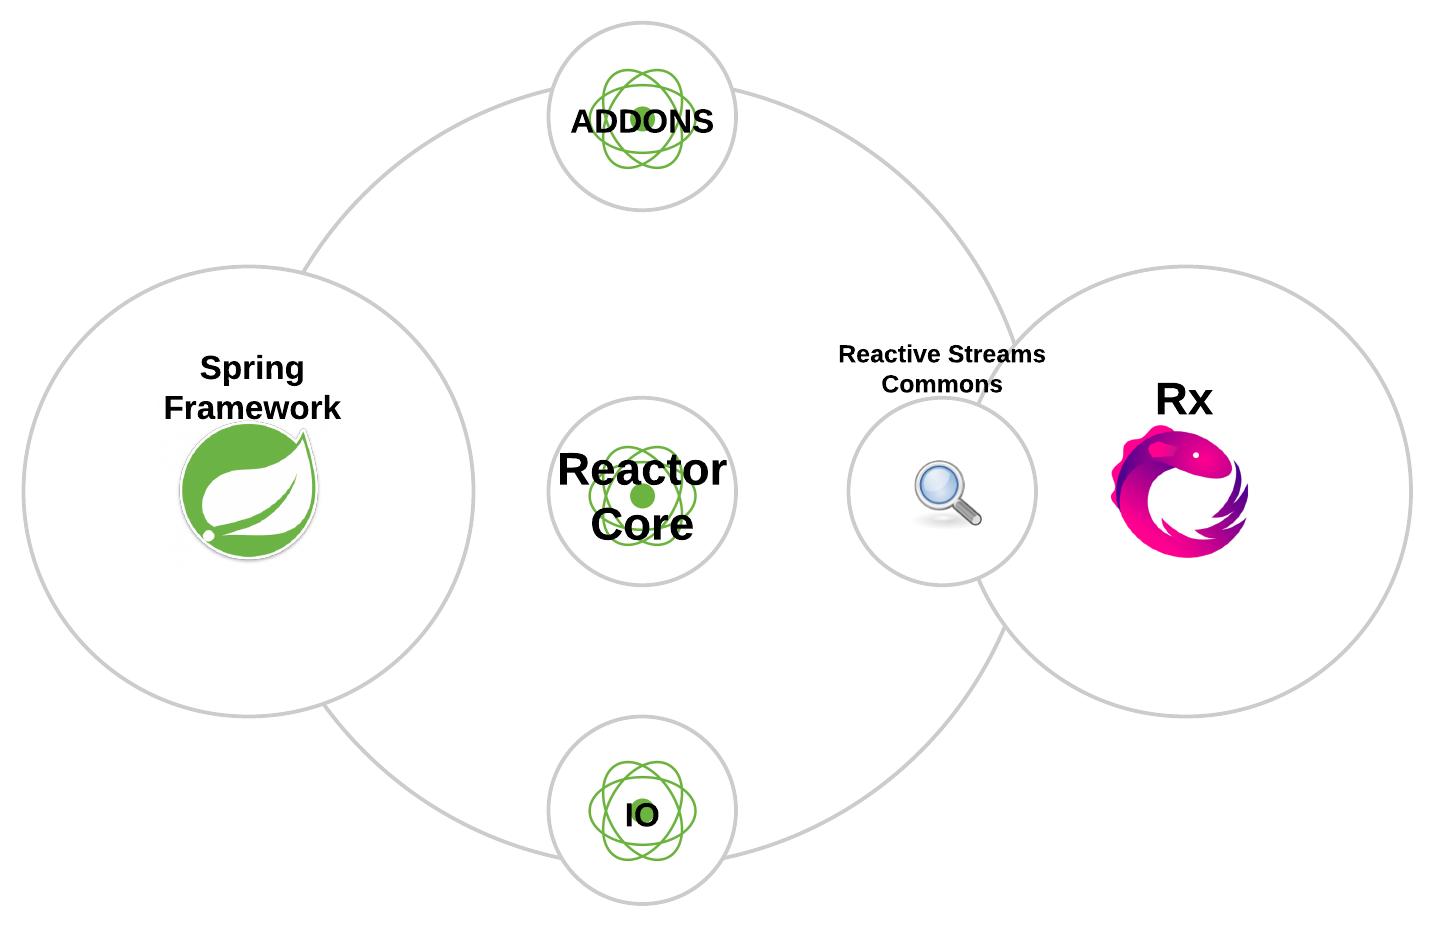 Spring Framework and reactive applications - Hands-On Spring